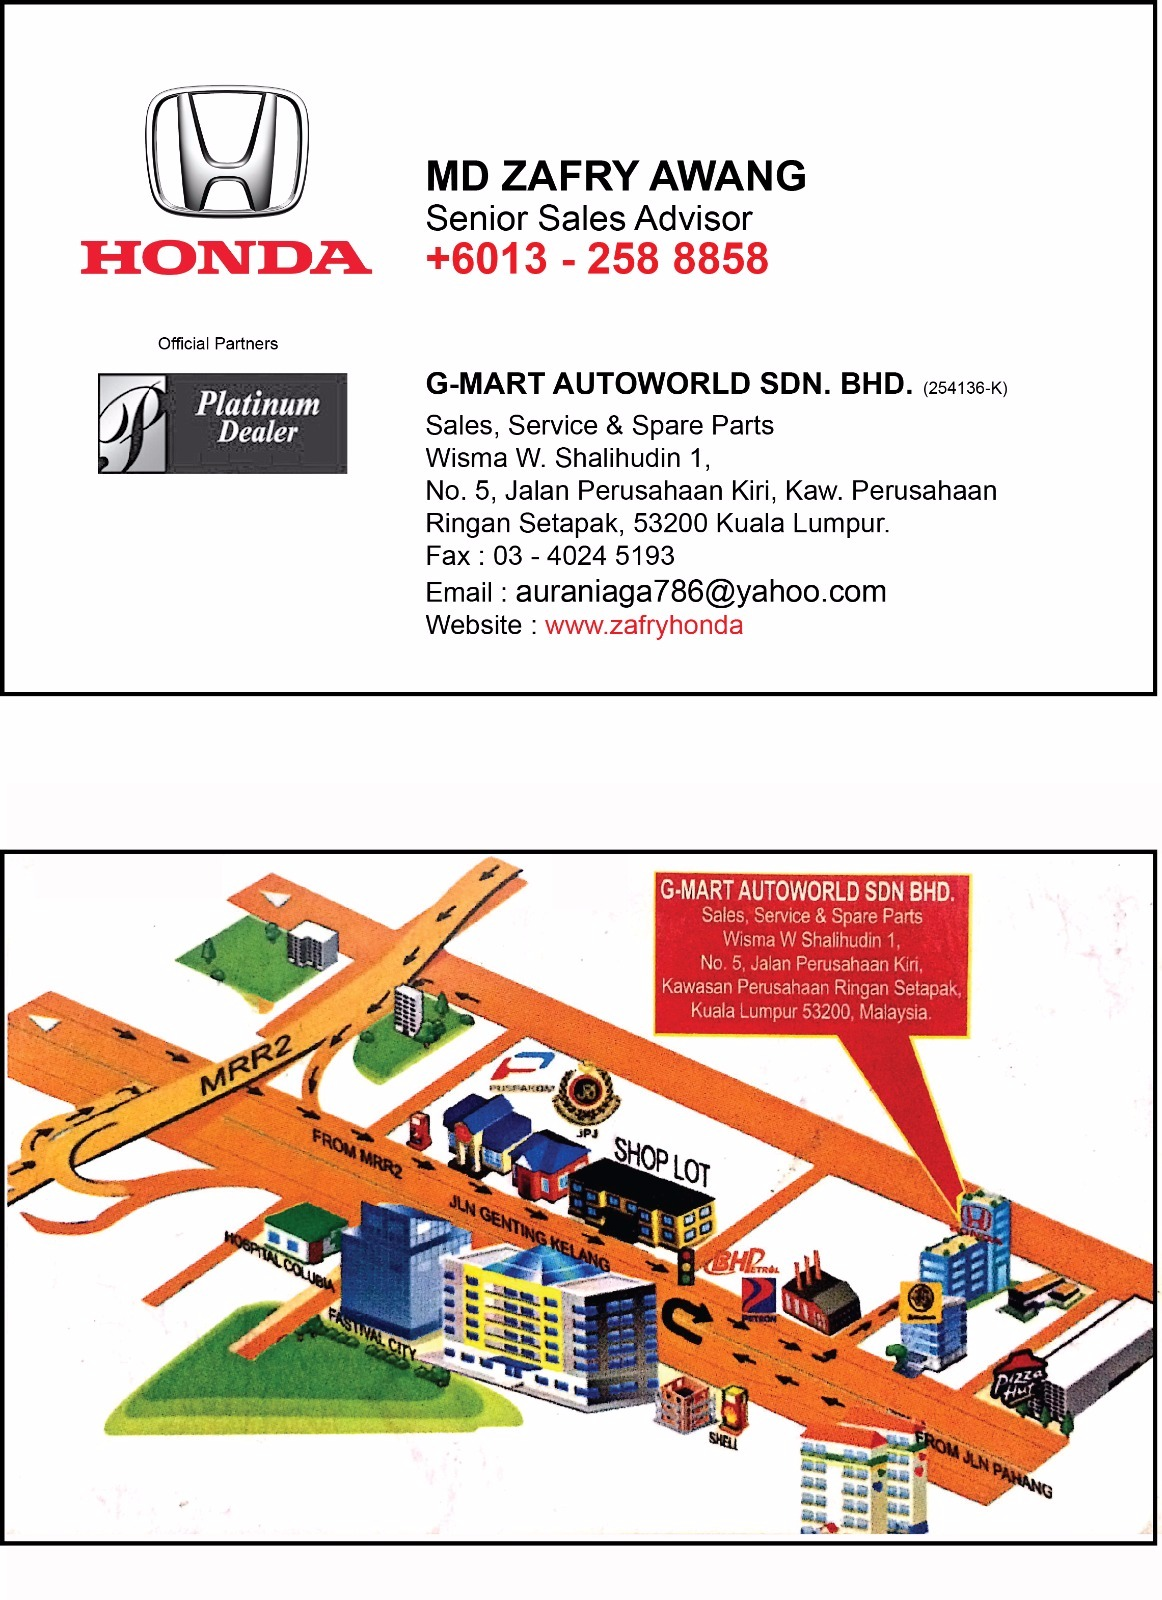 honda malaysia promotion riang ria raya    info  zafryhonda contact